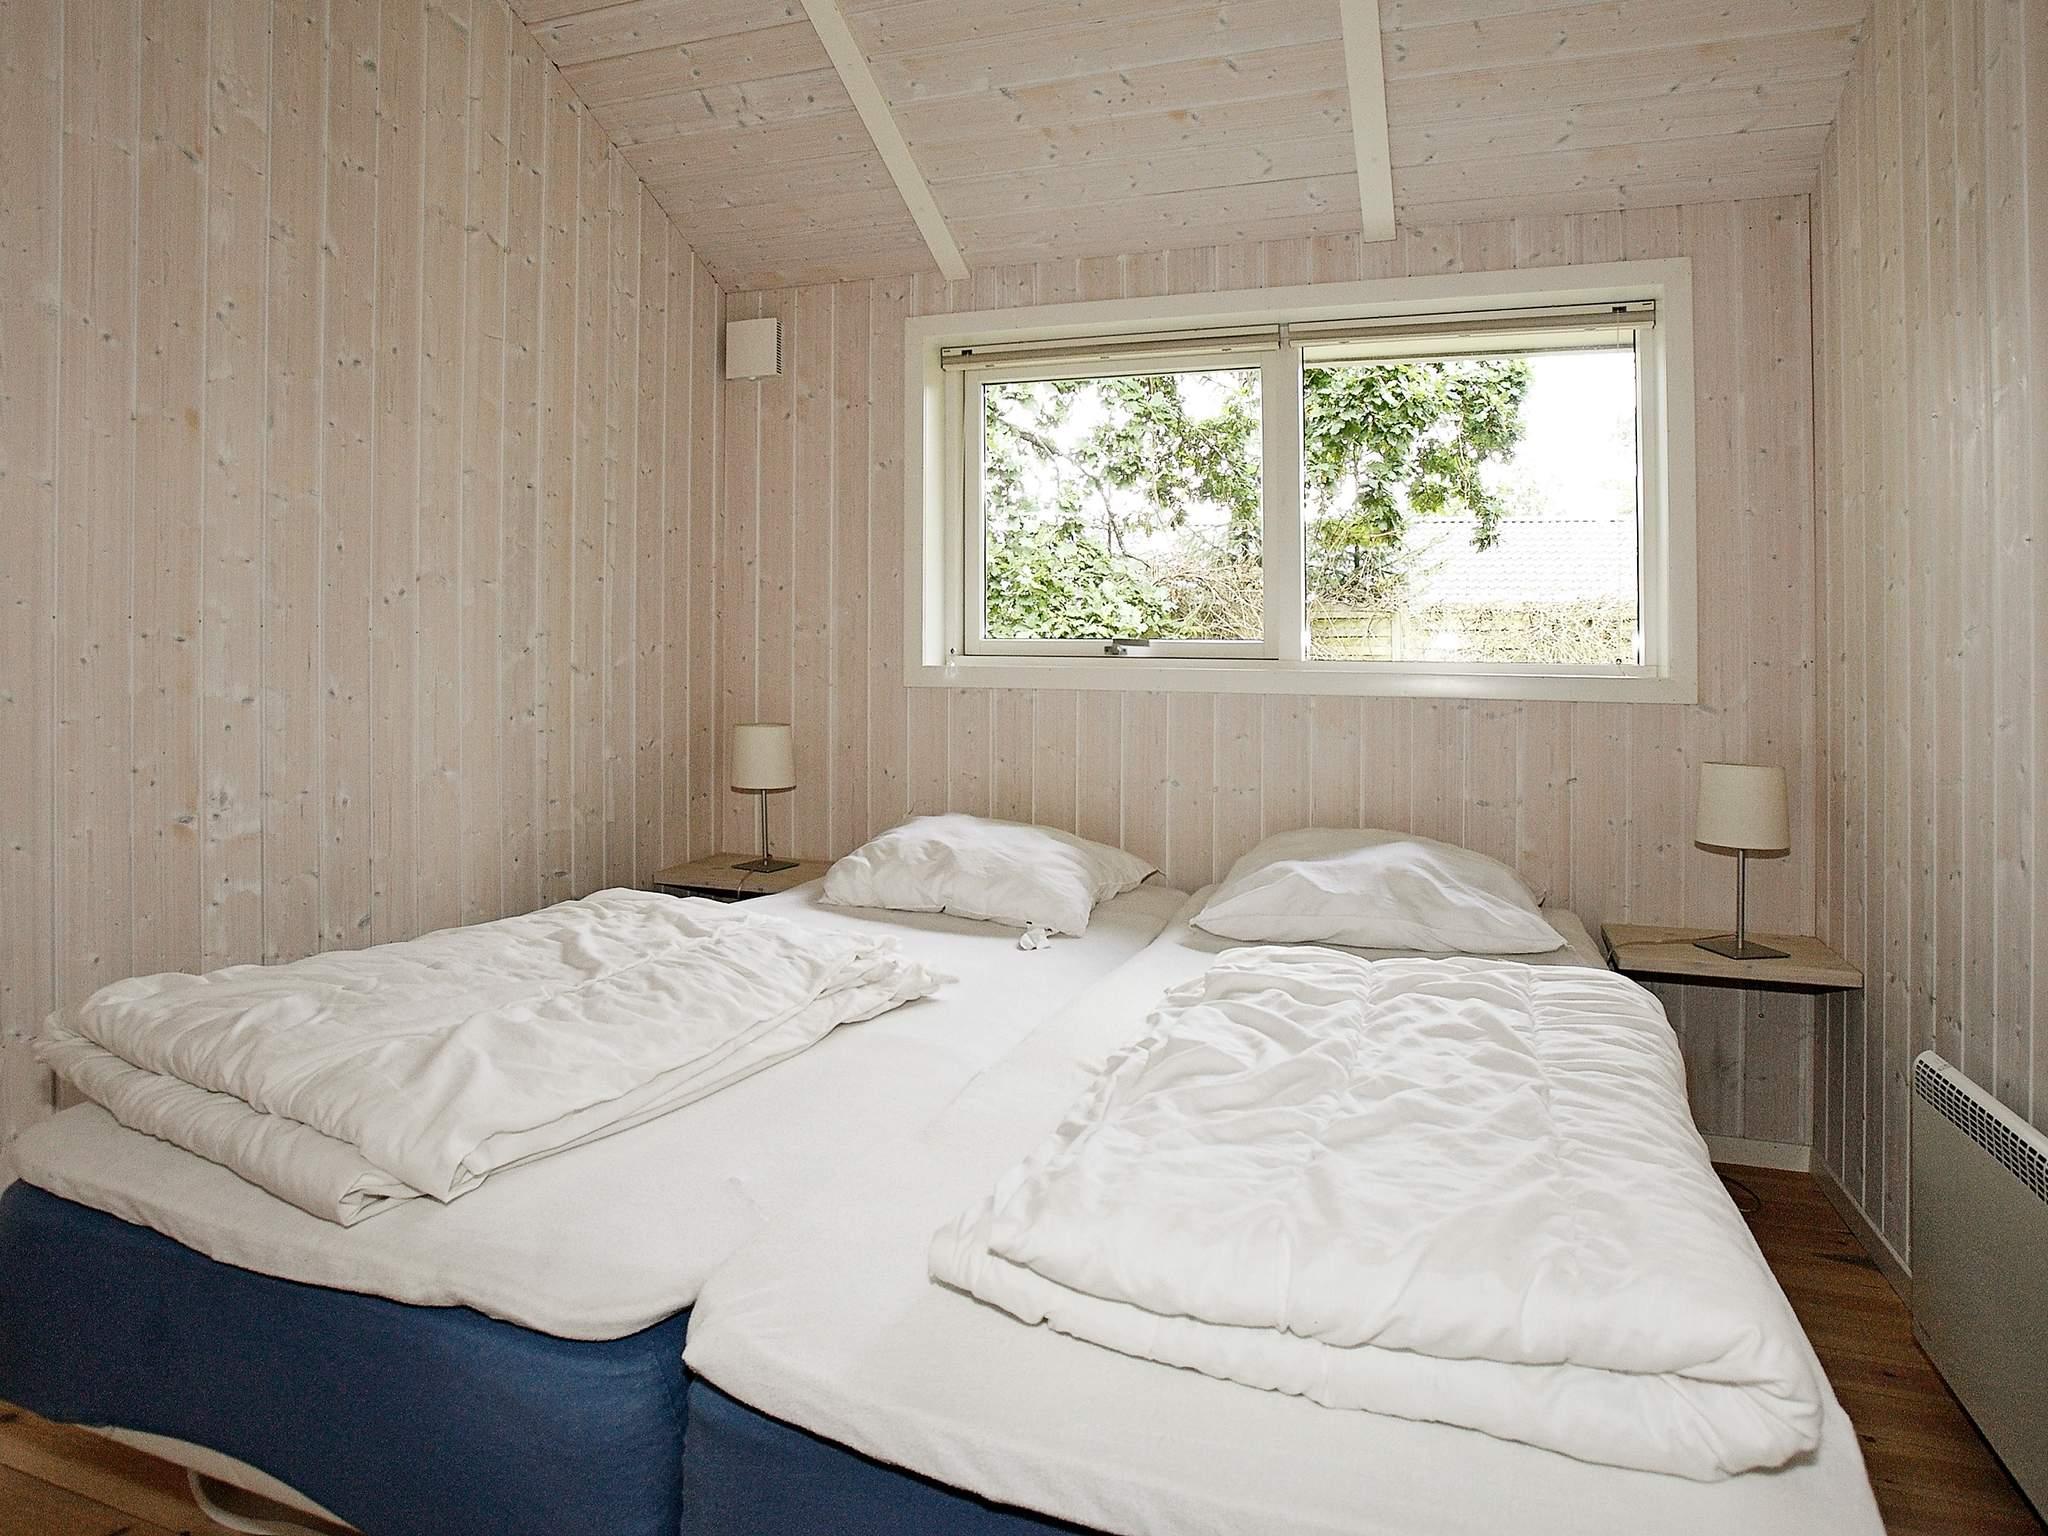 Ferienhaus Øster Hurup (1028934), Øster Hurup, , Ostjütland, Dänemark, Bild 4